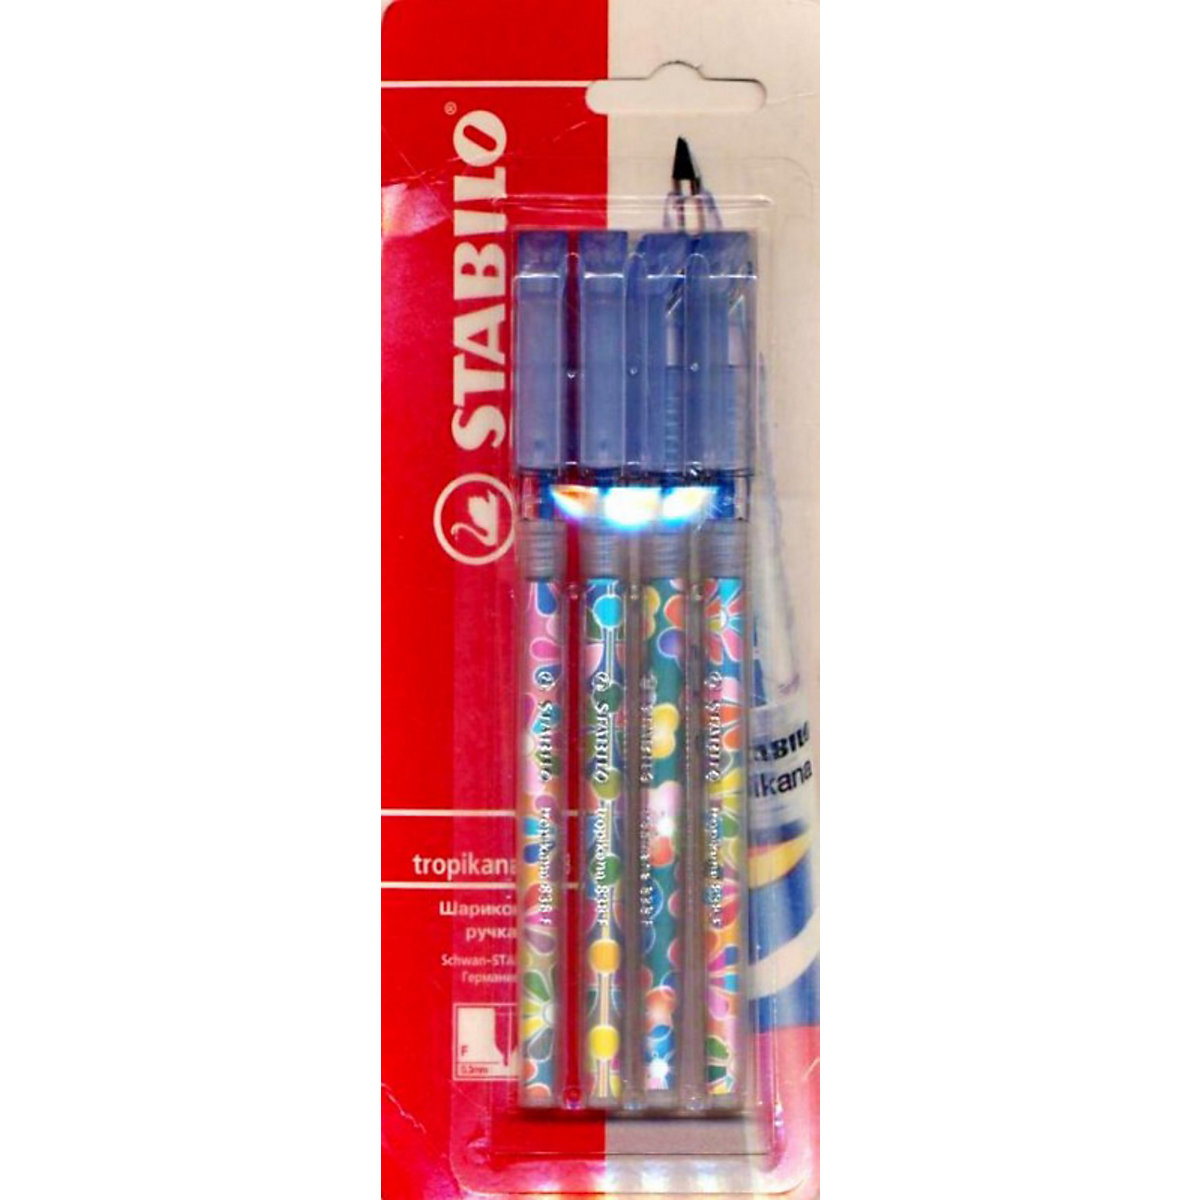 STABILO Pen Grips 3157362 Pens Ball The Gel Pencils Writing Supplies MTpromo